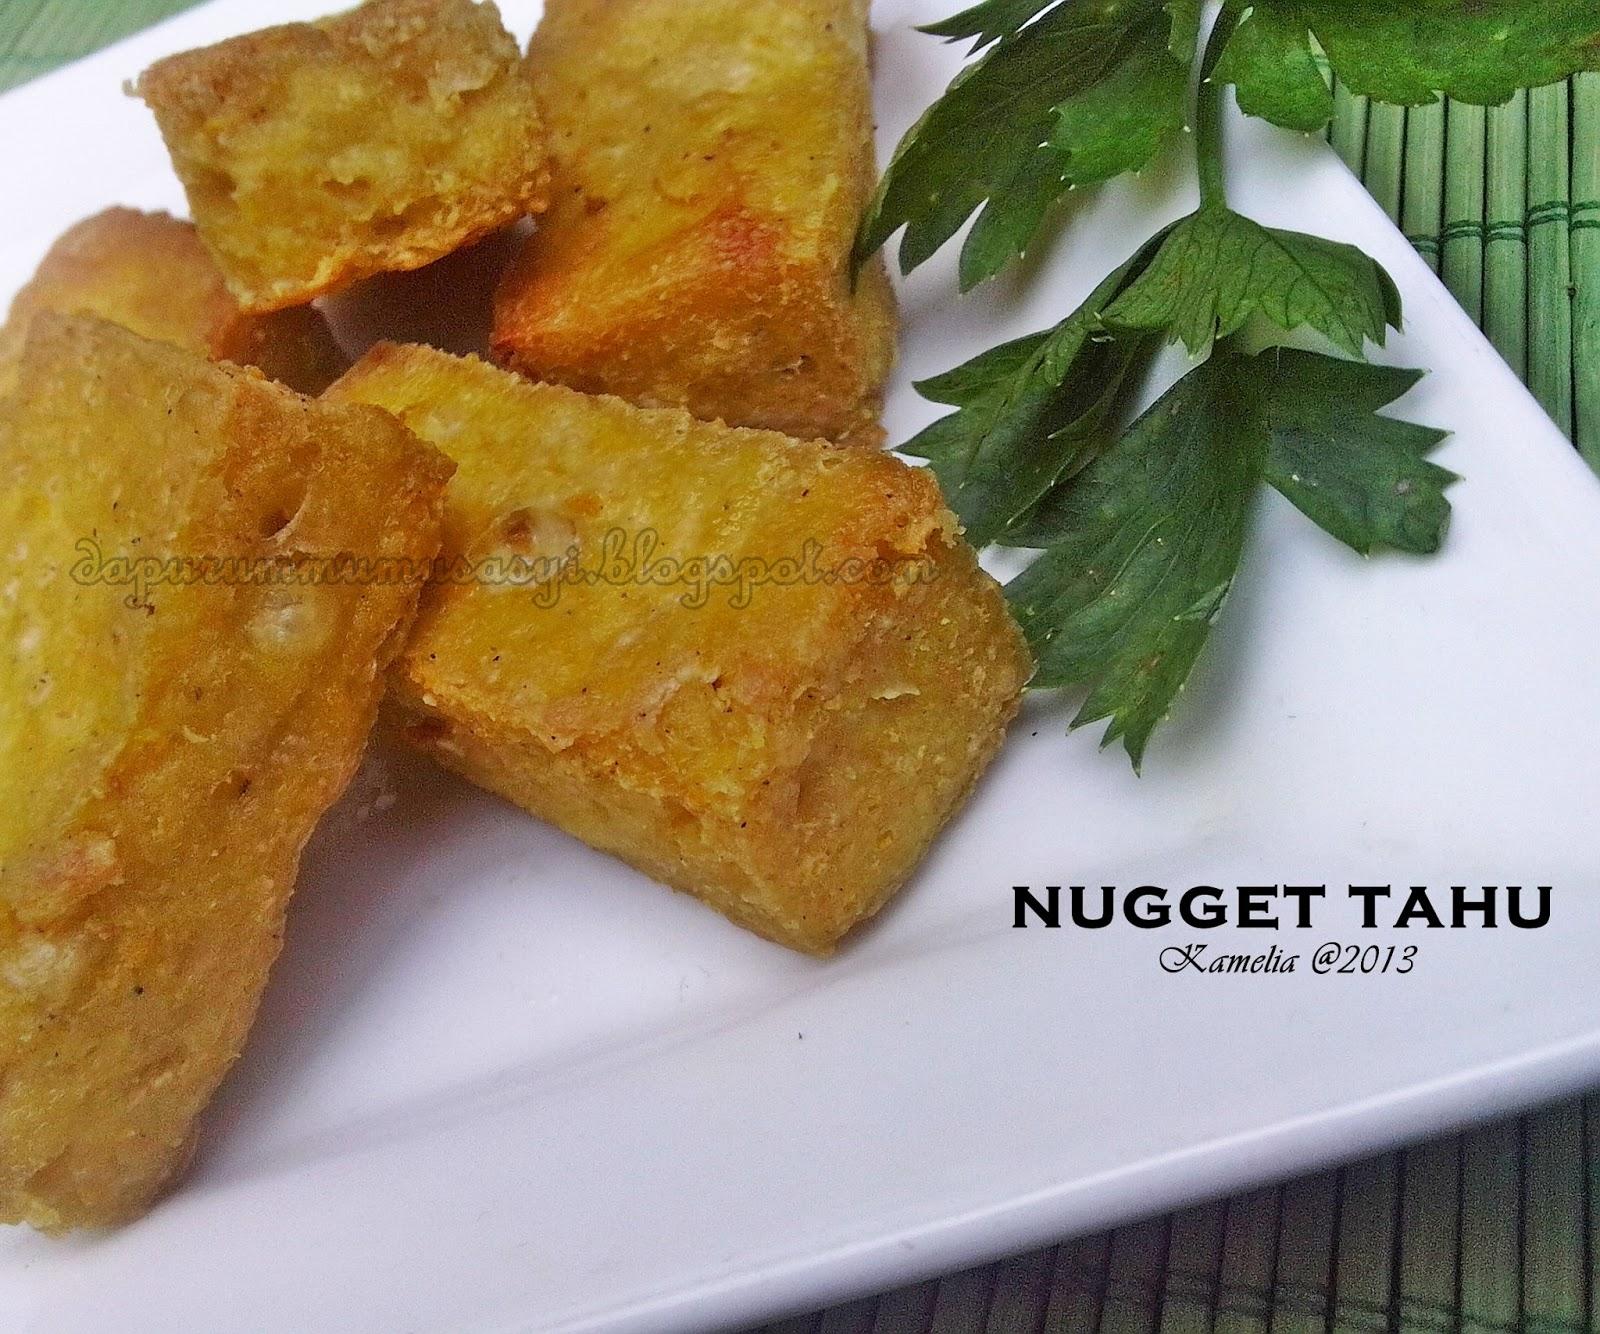 Nugget Ayam Tahu: Cozy Kitchen : Nugget Tahu ' Minimalis ' ( PR DA, April 2013